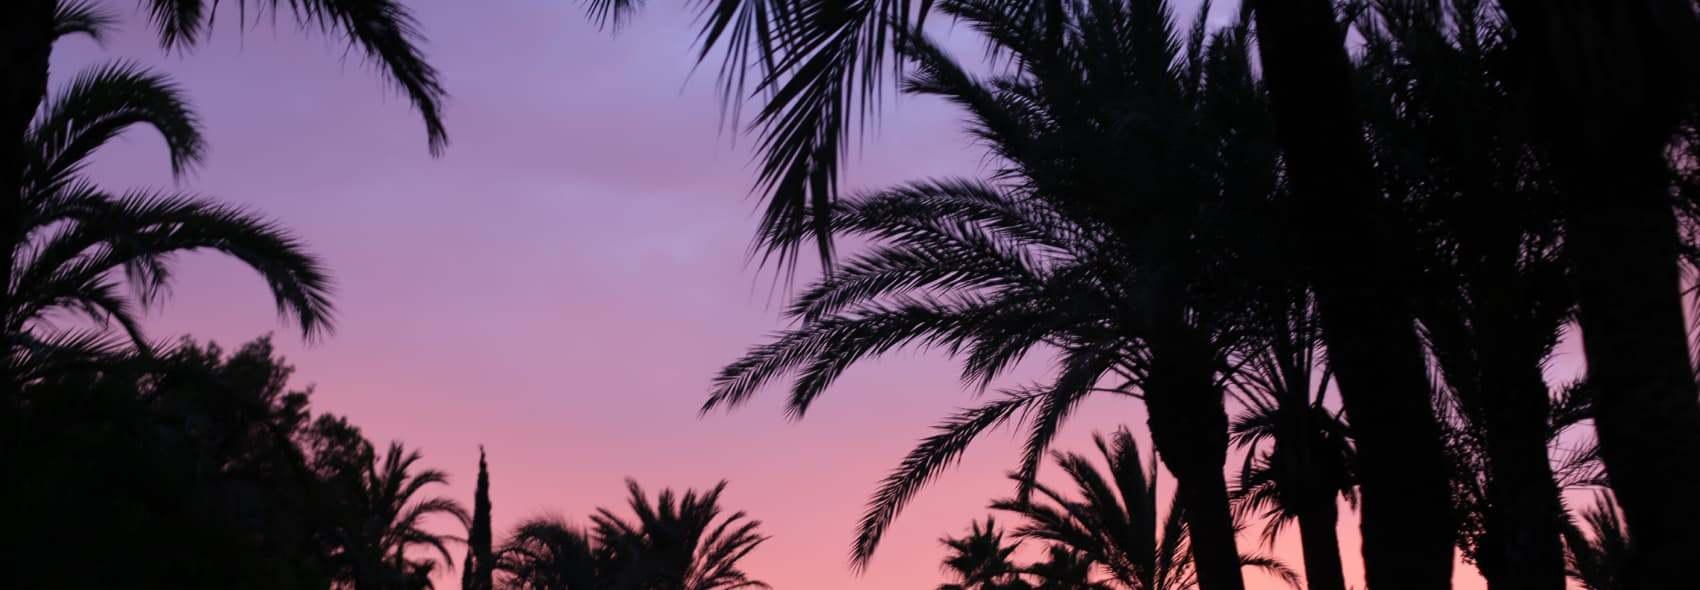 Img2 2x Palm Trees